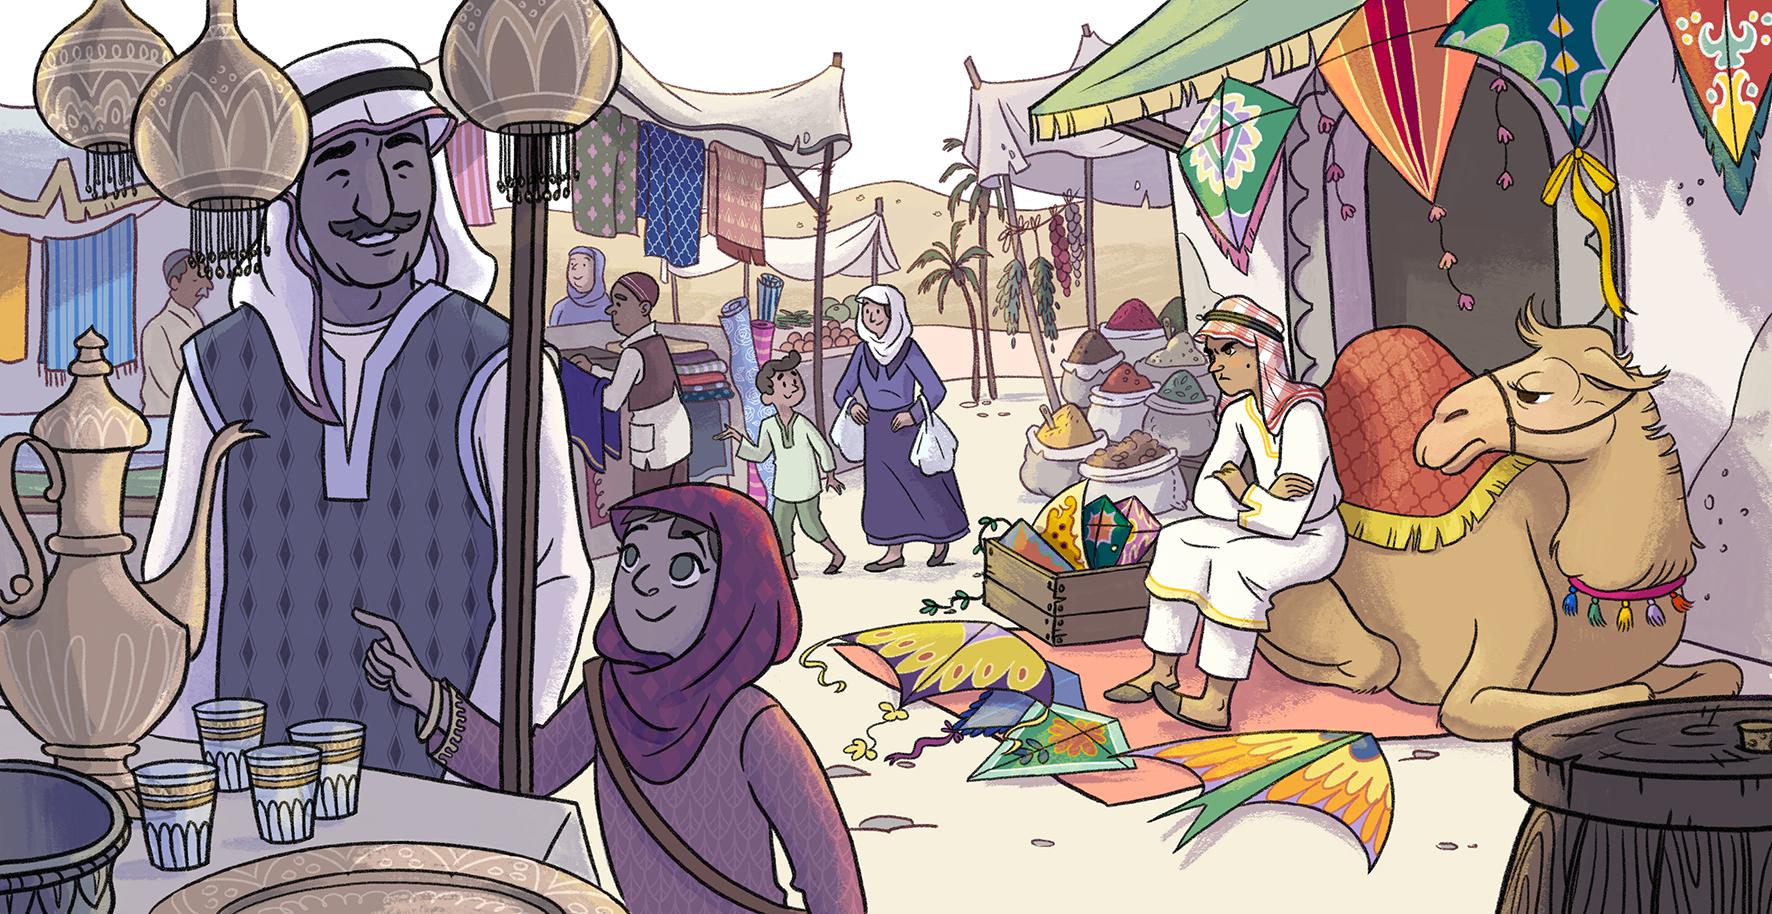 Kina and the Kite Seller